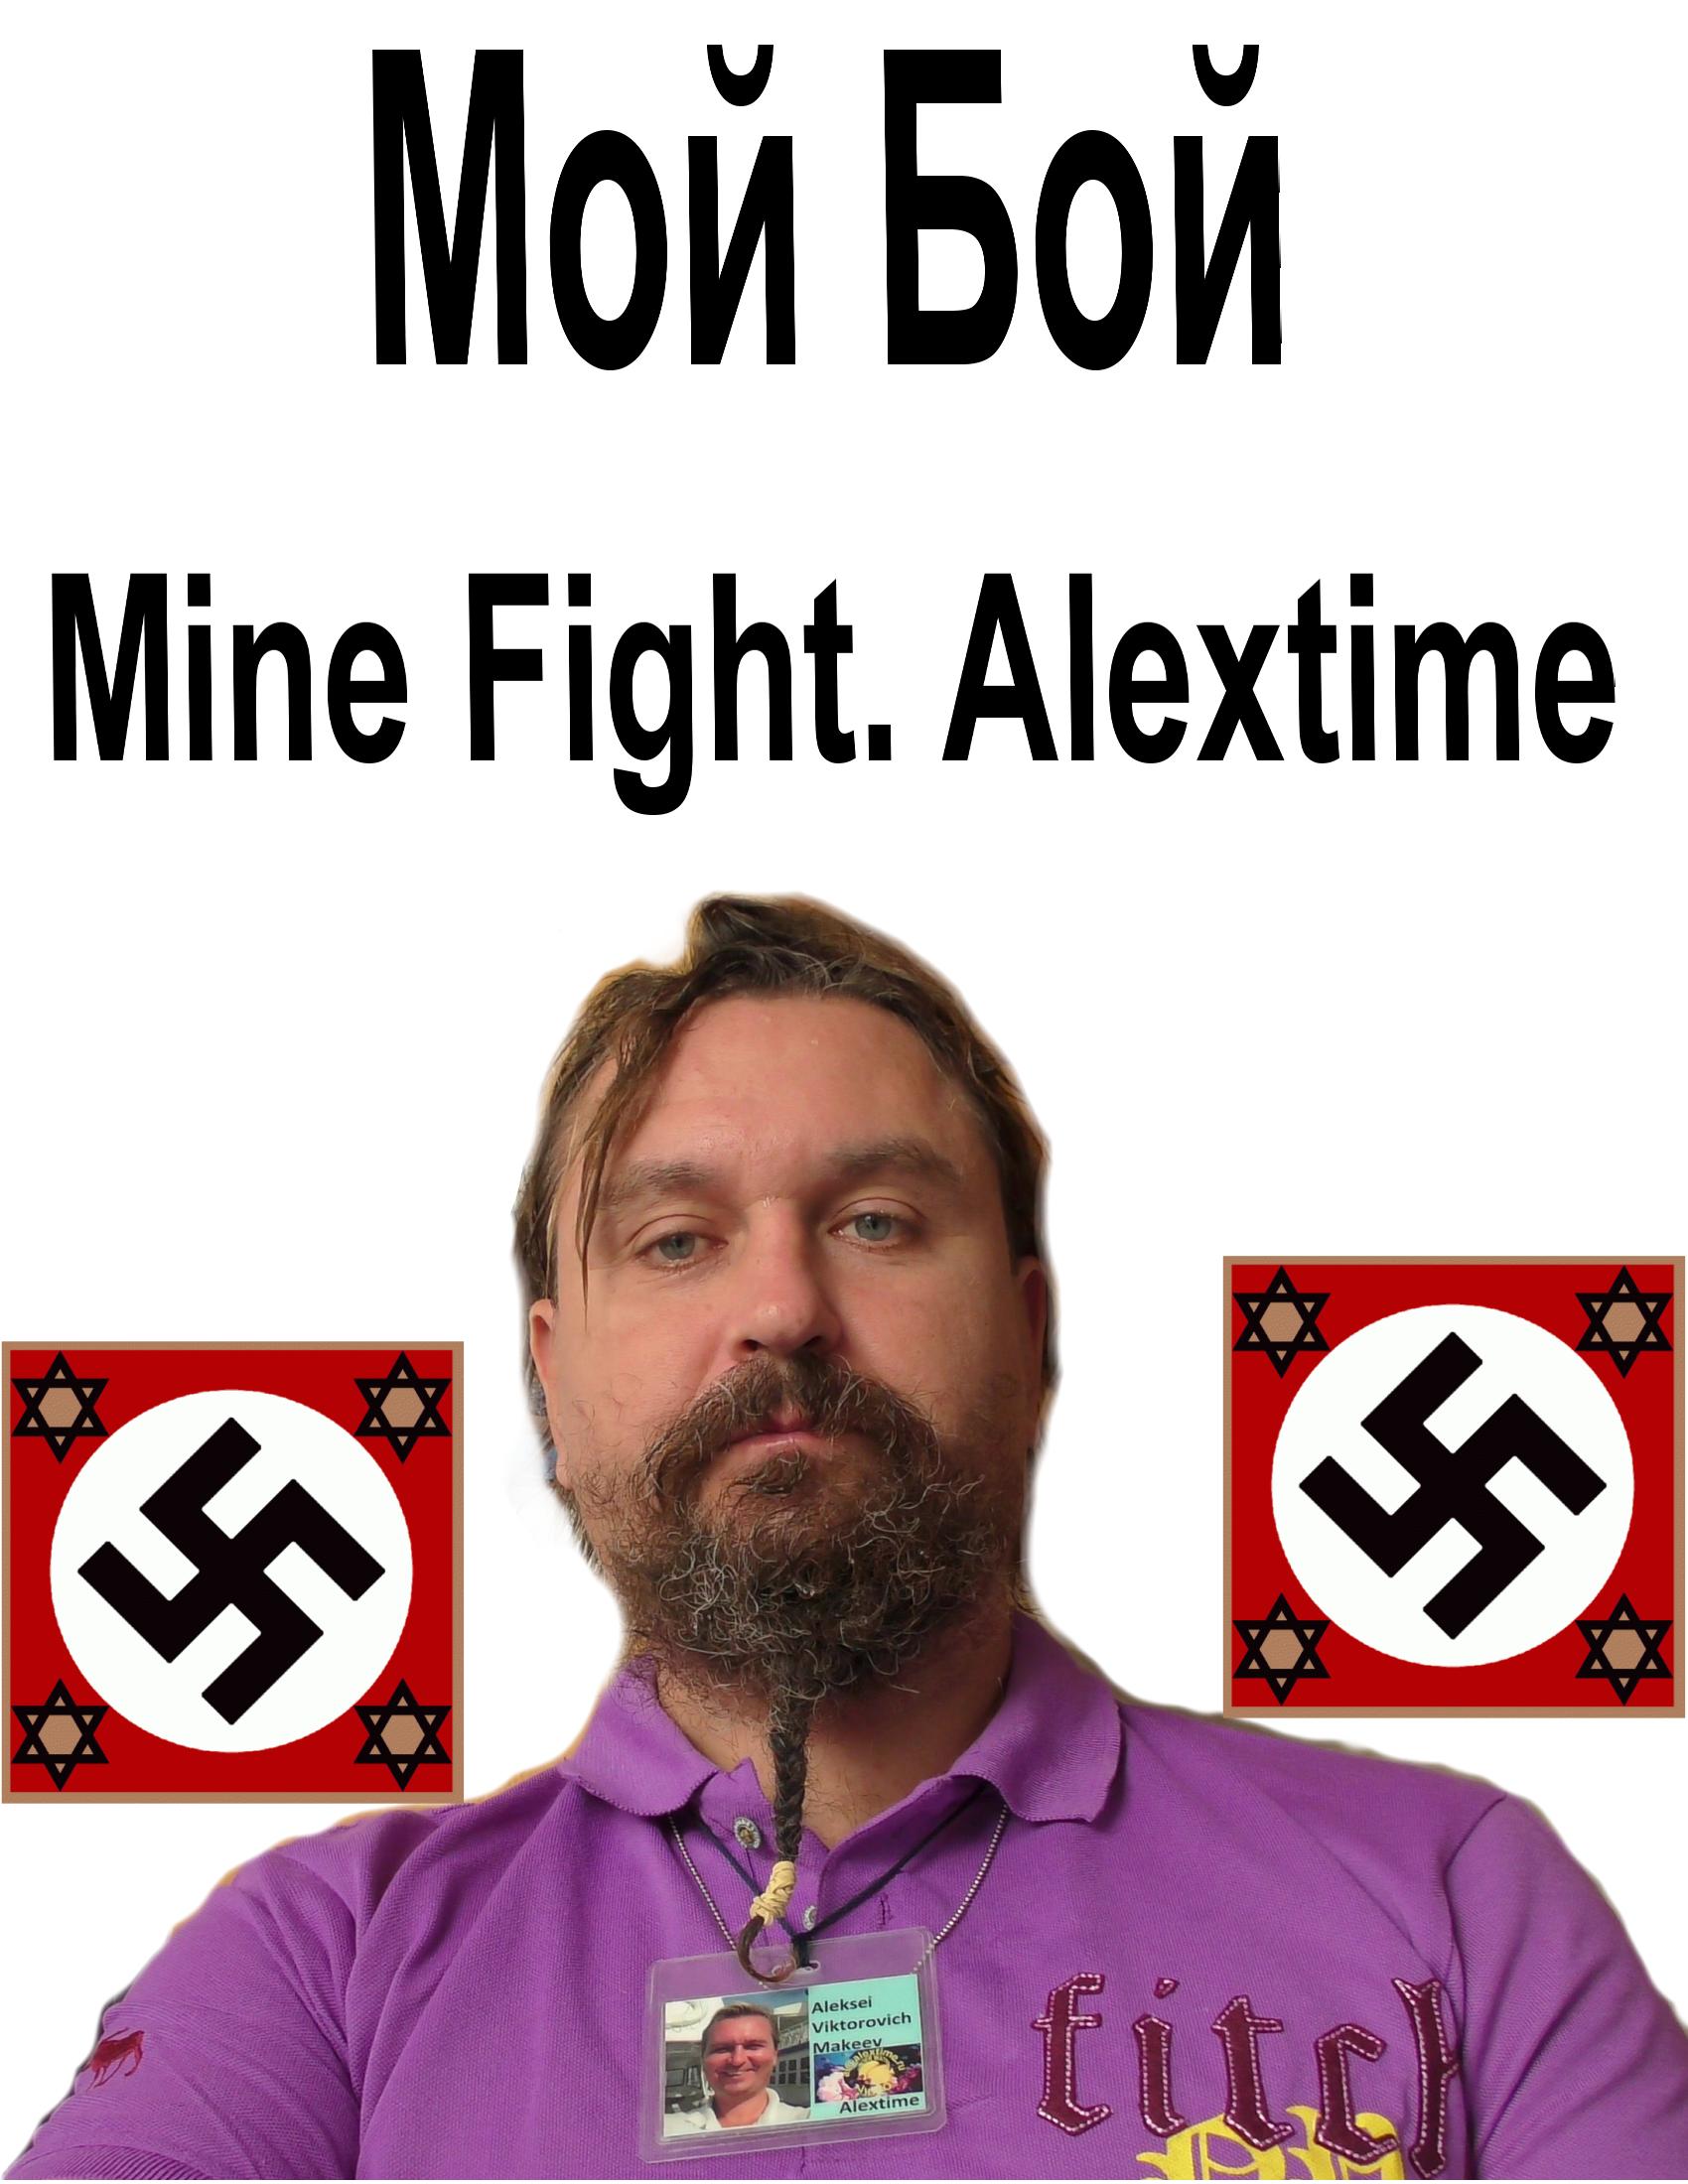 MineFightAlextime.png